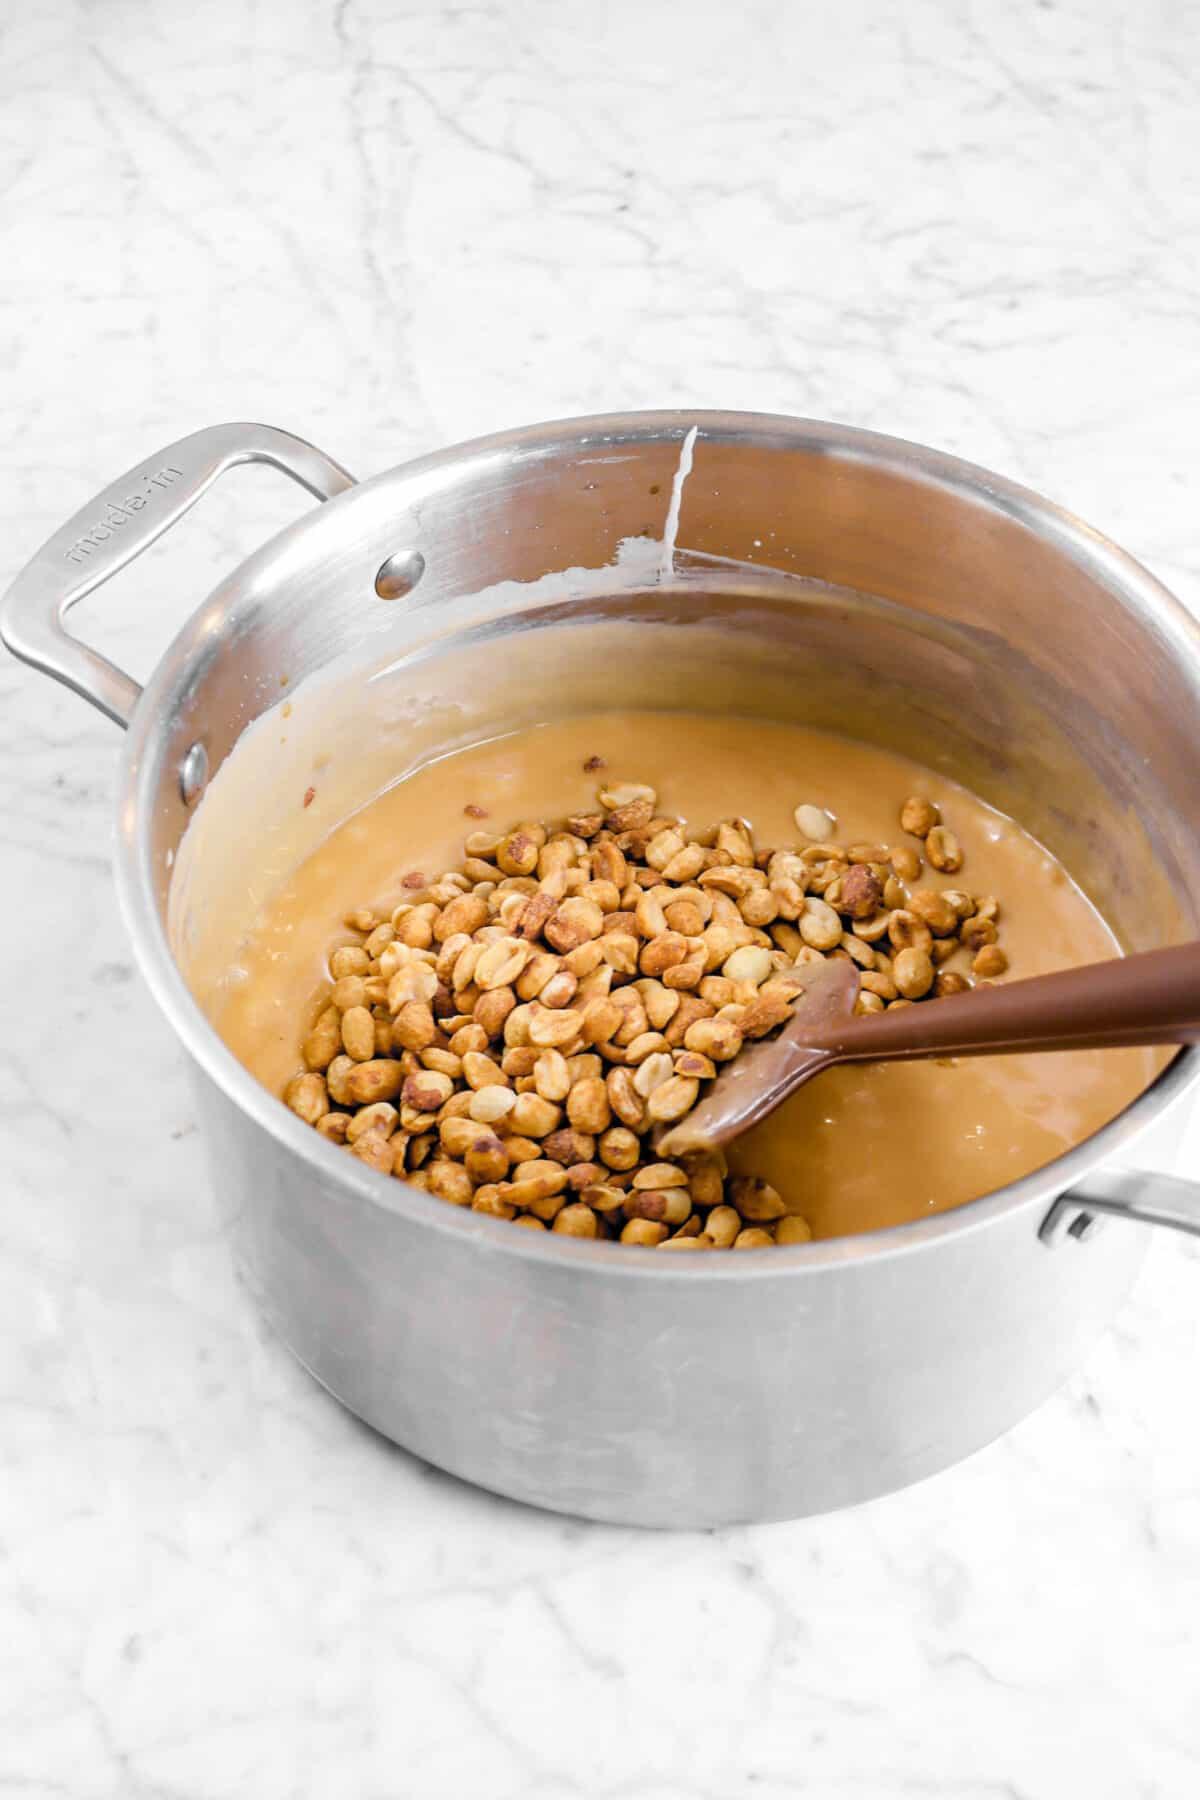 peanut added to caramel